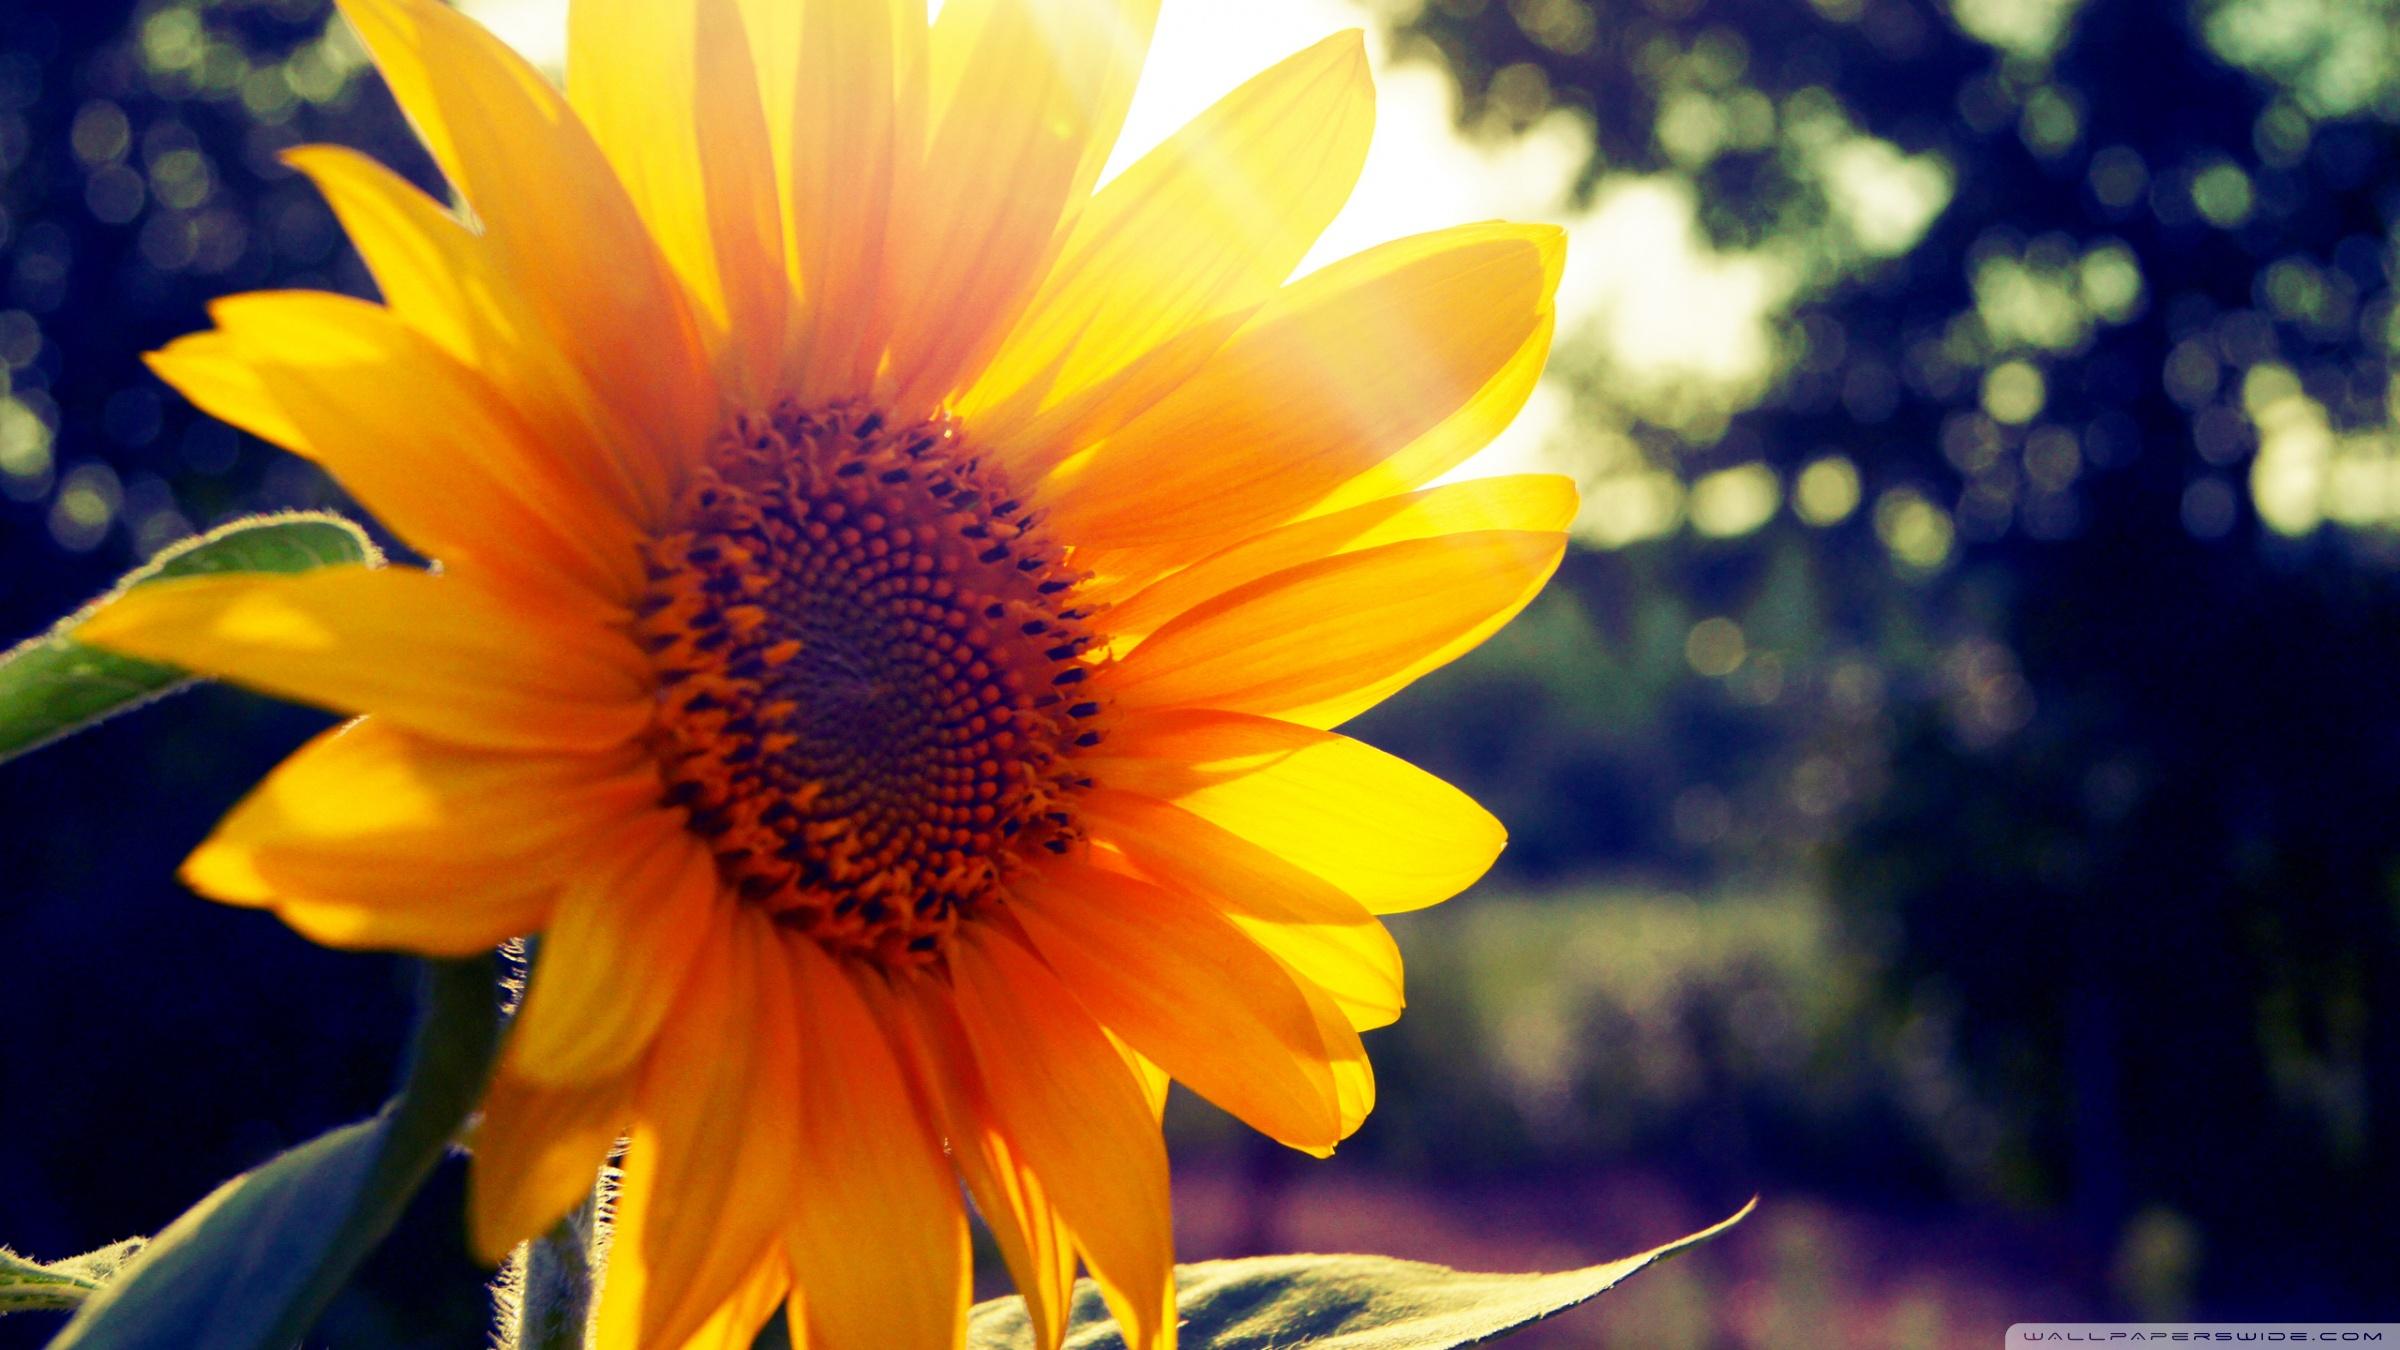 sunflower 8 wallpaper 1920x1080 - photo #16